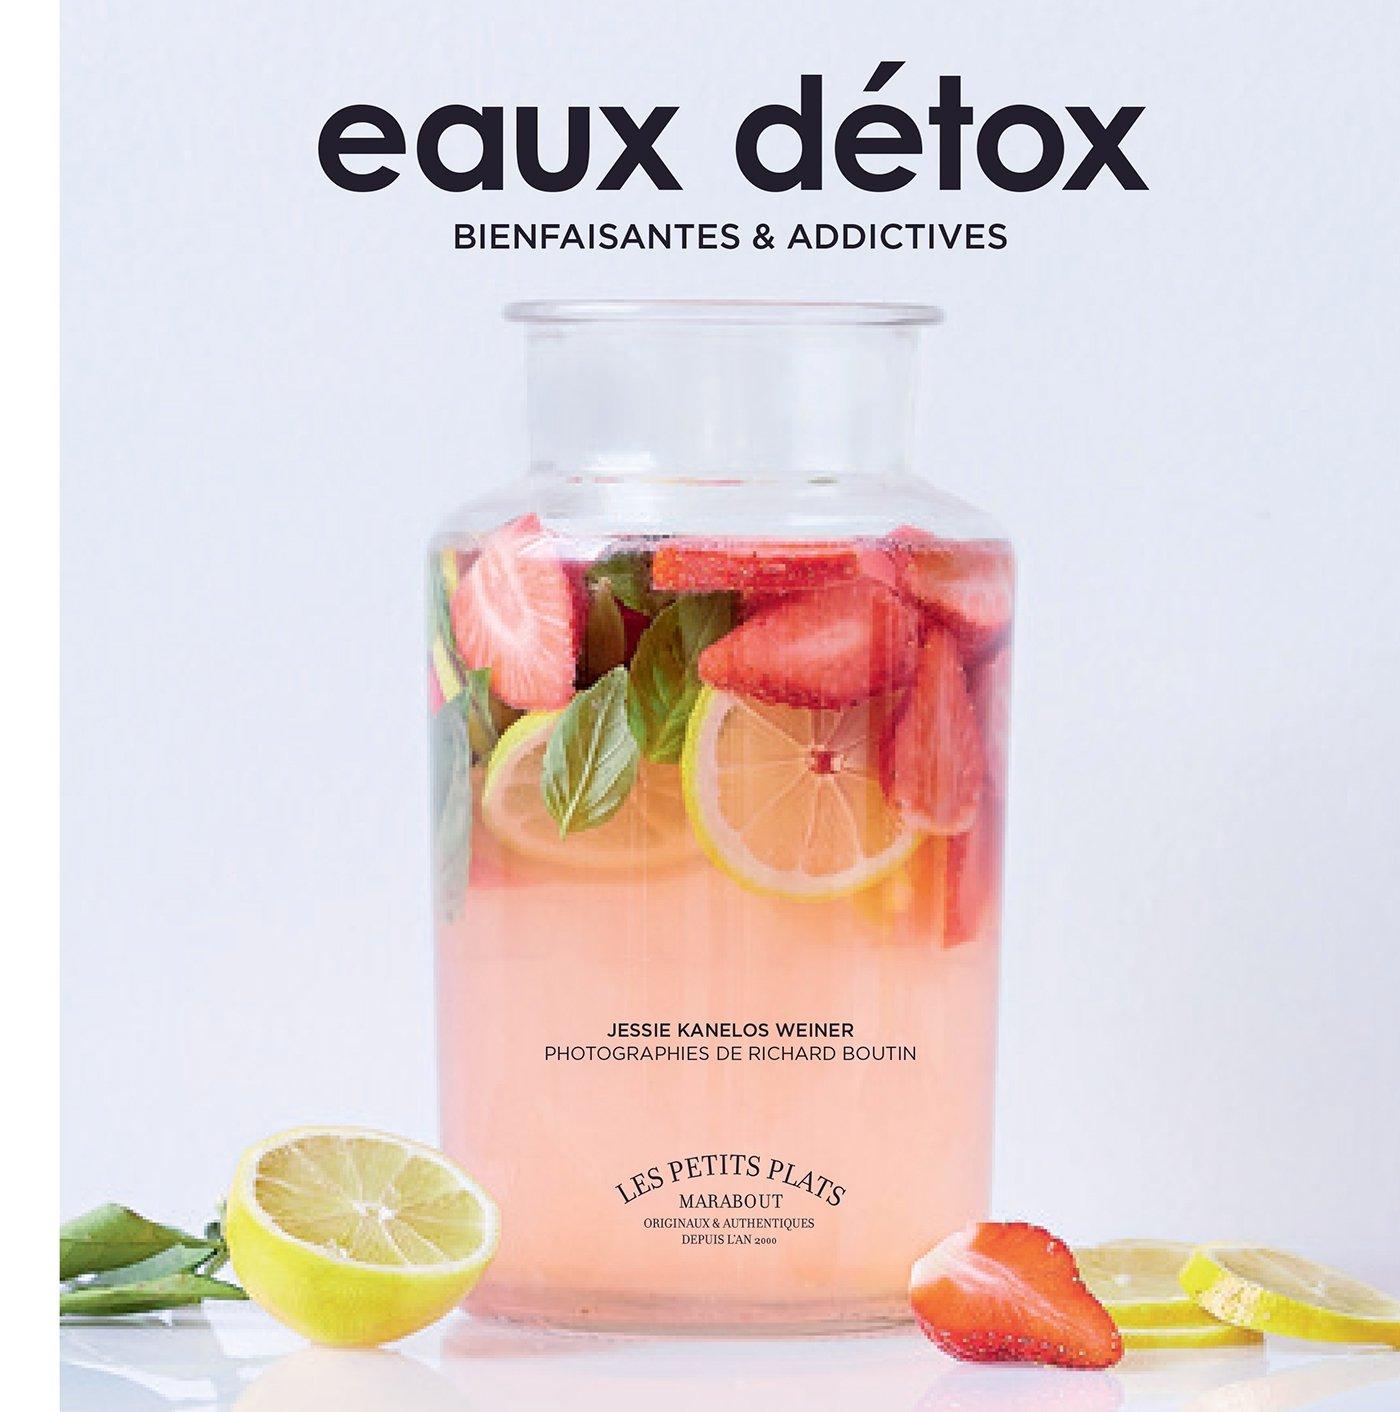 Assez Amazon.fr - Eaux détox - Jessie Kanelos Weiner, Richard Boutin  CX56